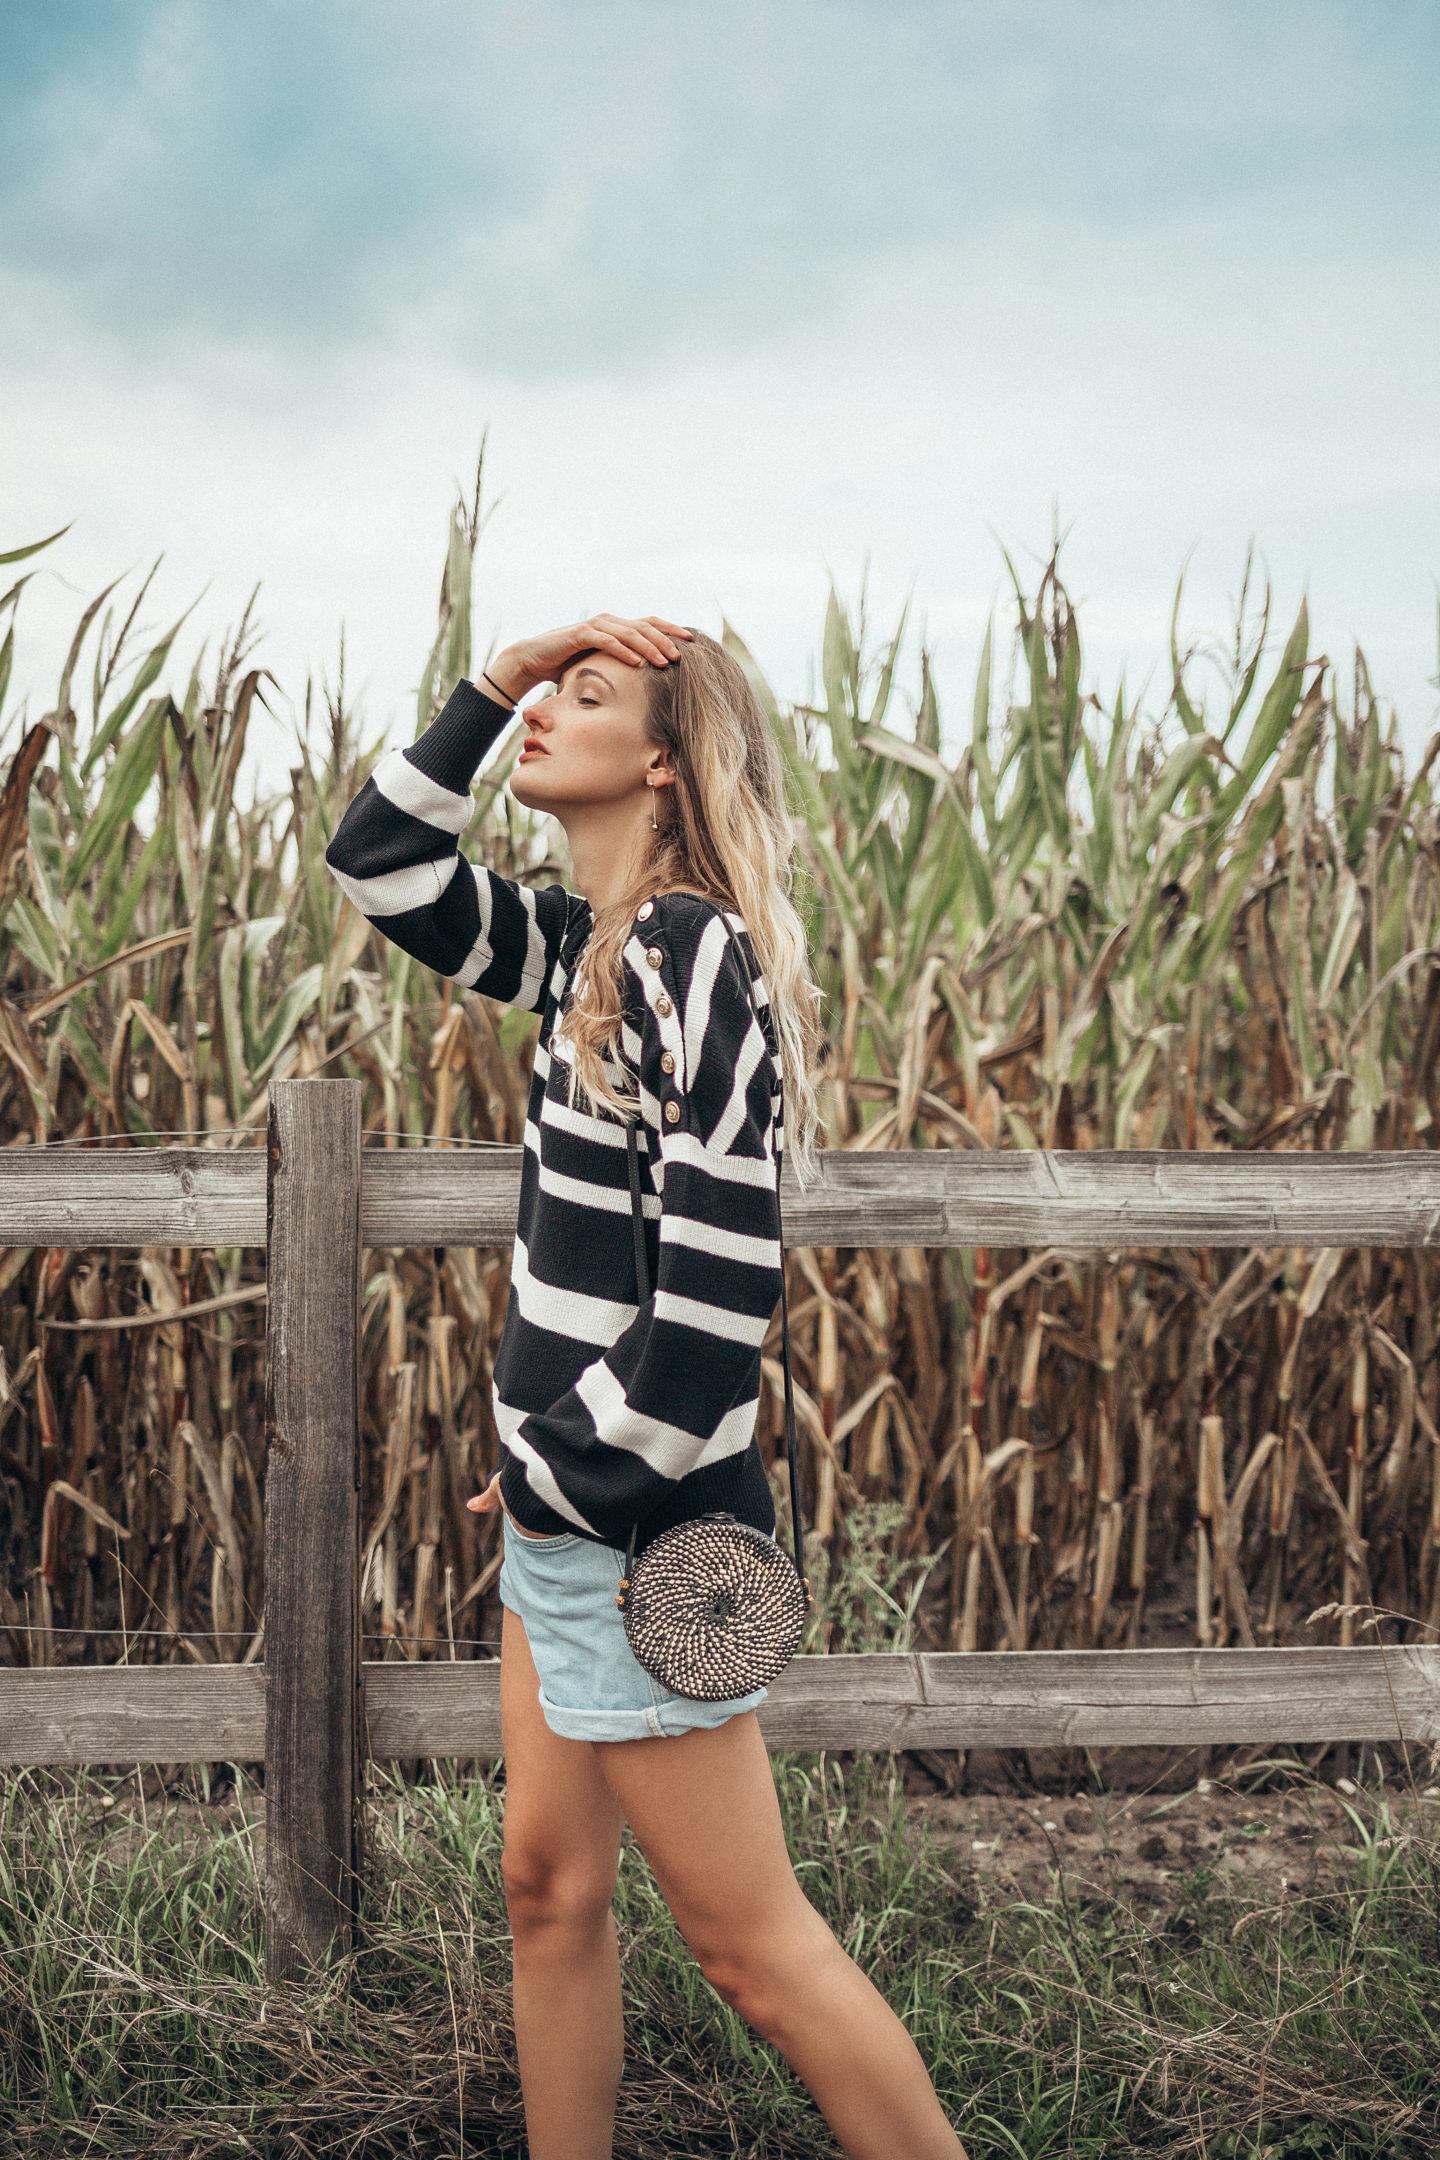 milieubewuste kleding